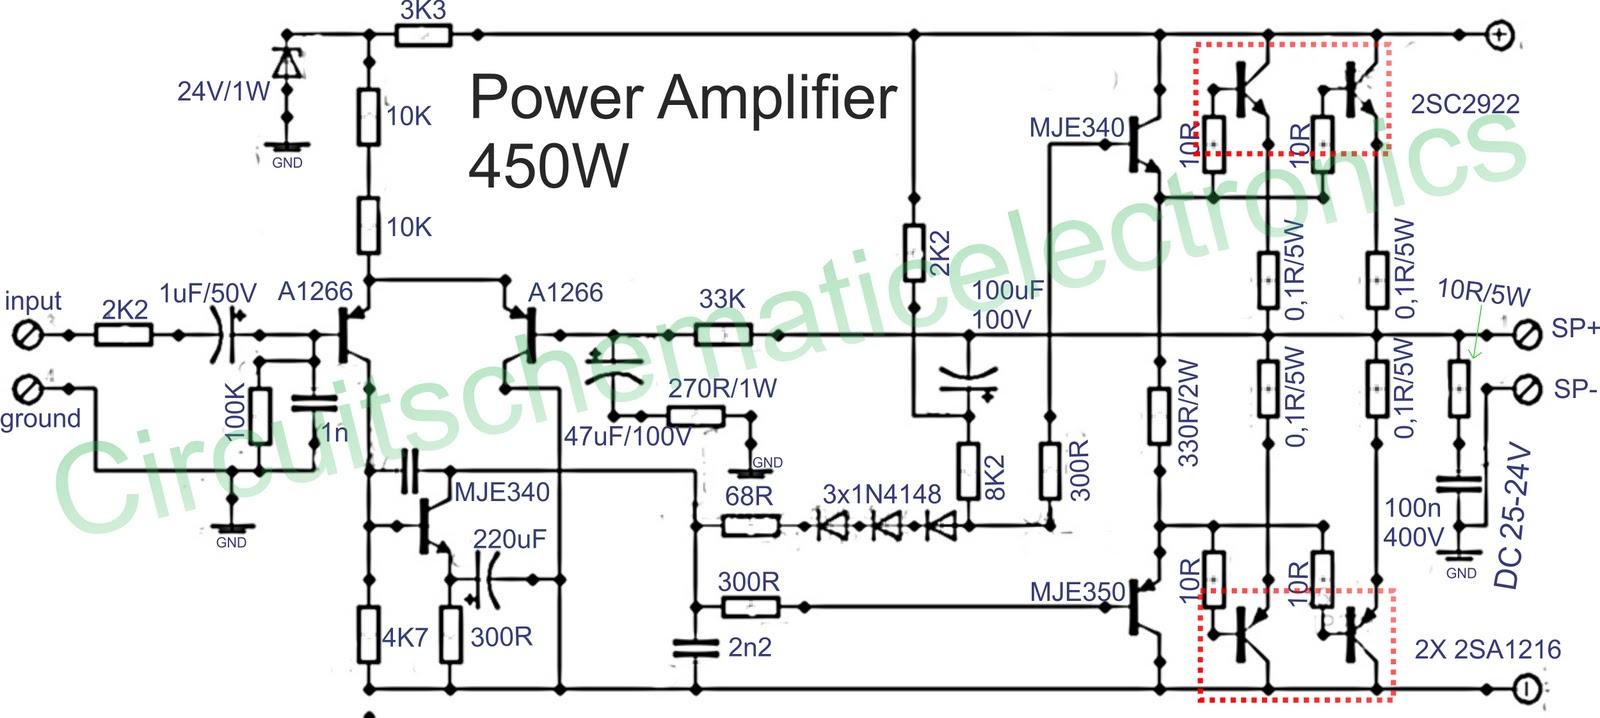 Mitsubishi Celeste Wiring Diagram Excellent Electrical 4m40 Library Rh 62 Bloxhuette De Engine Timing 2 0